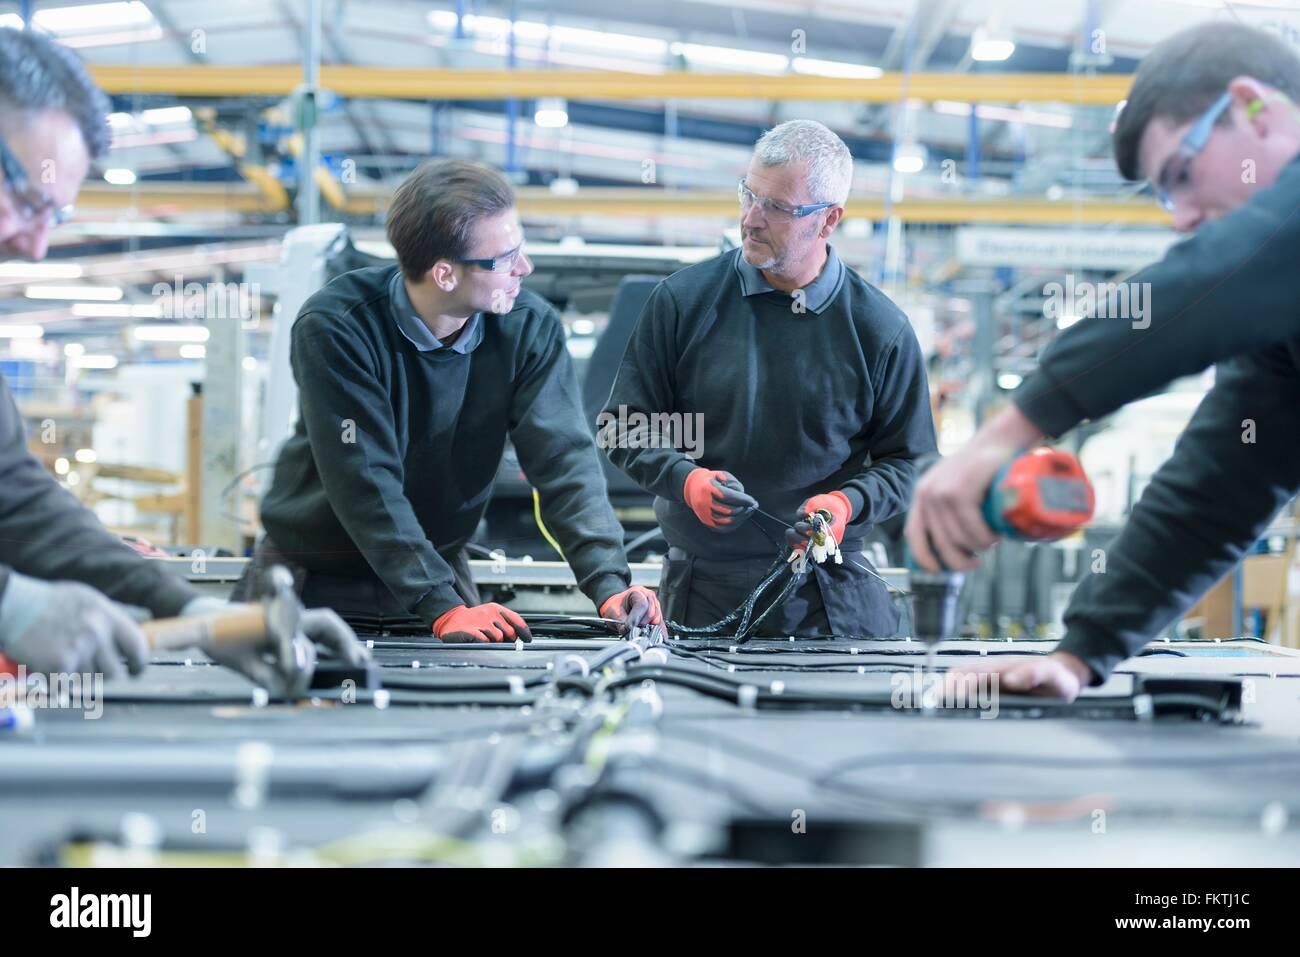 Arbeitnehmer auf Wohnmobil-Produktionslinie Stockbild